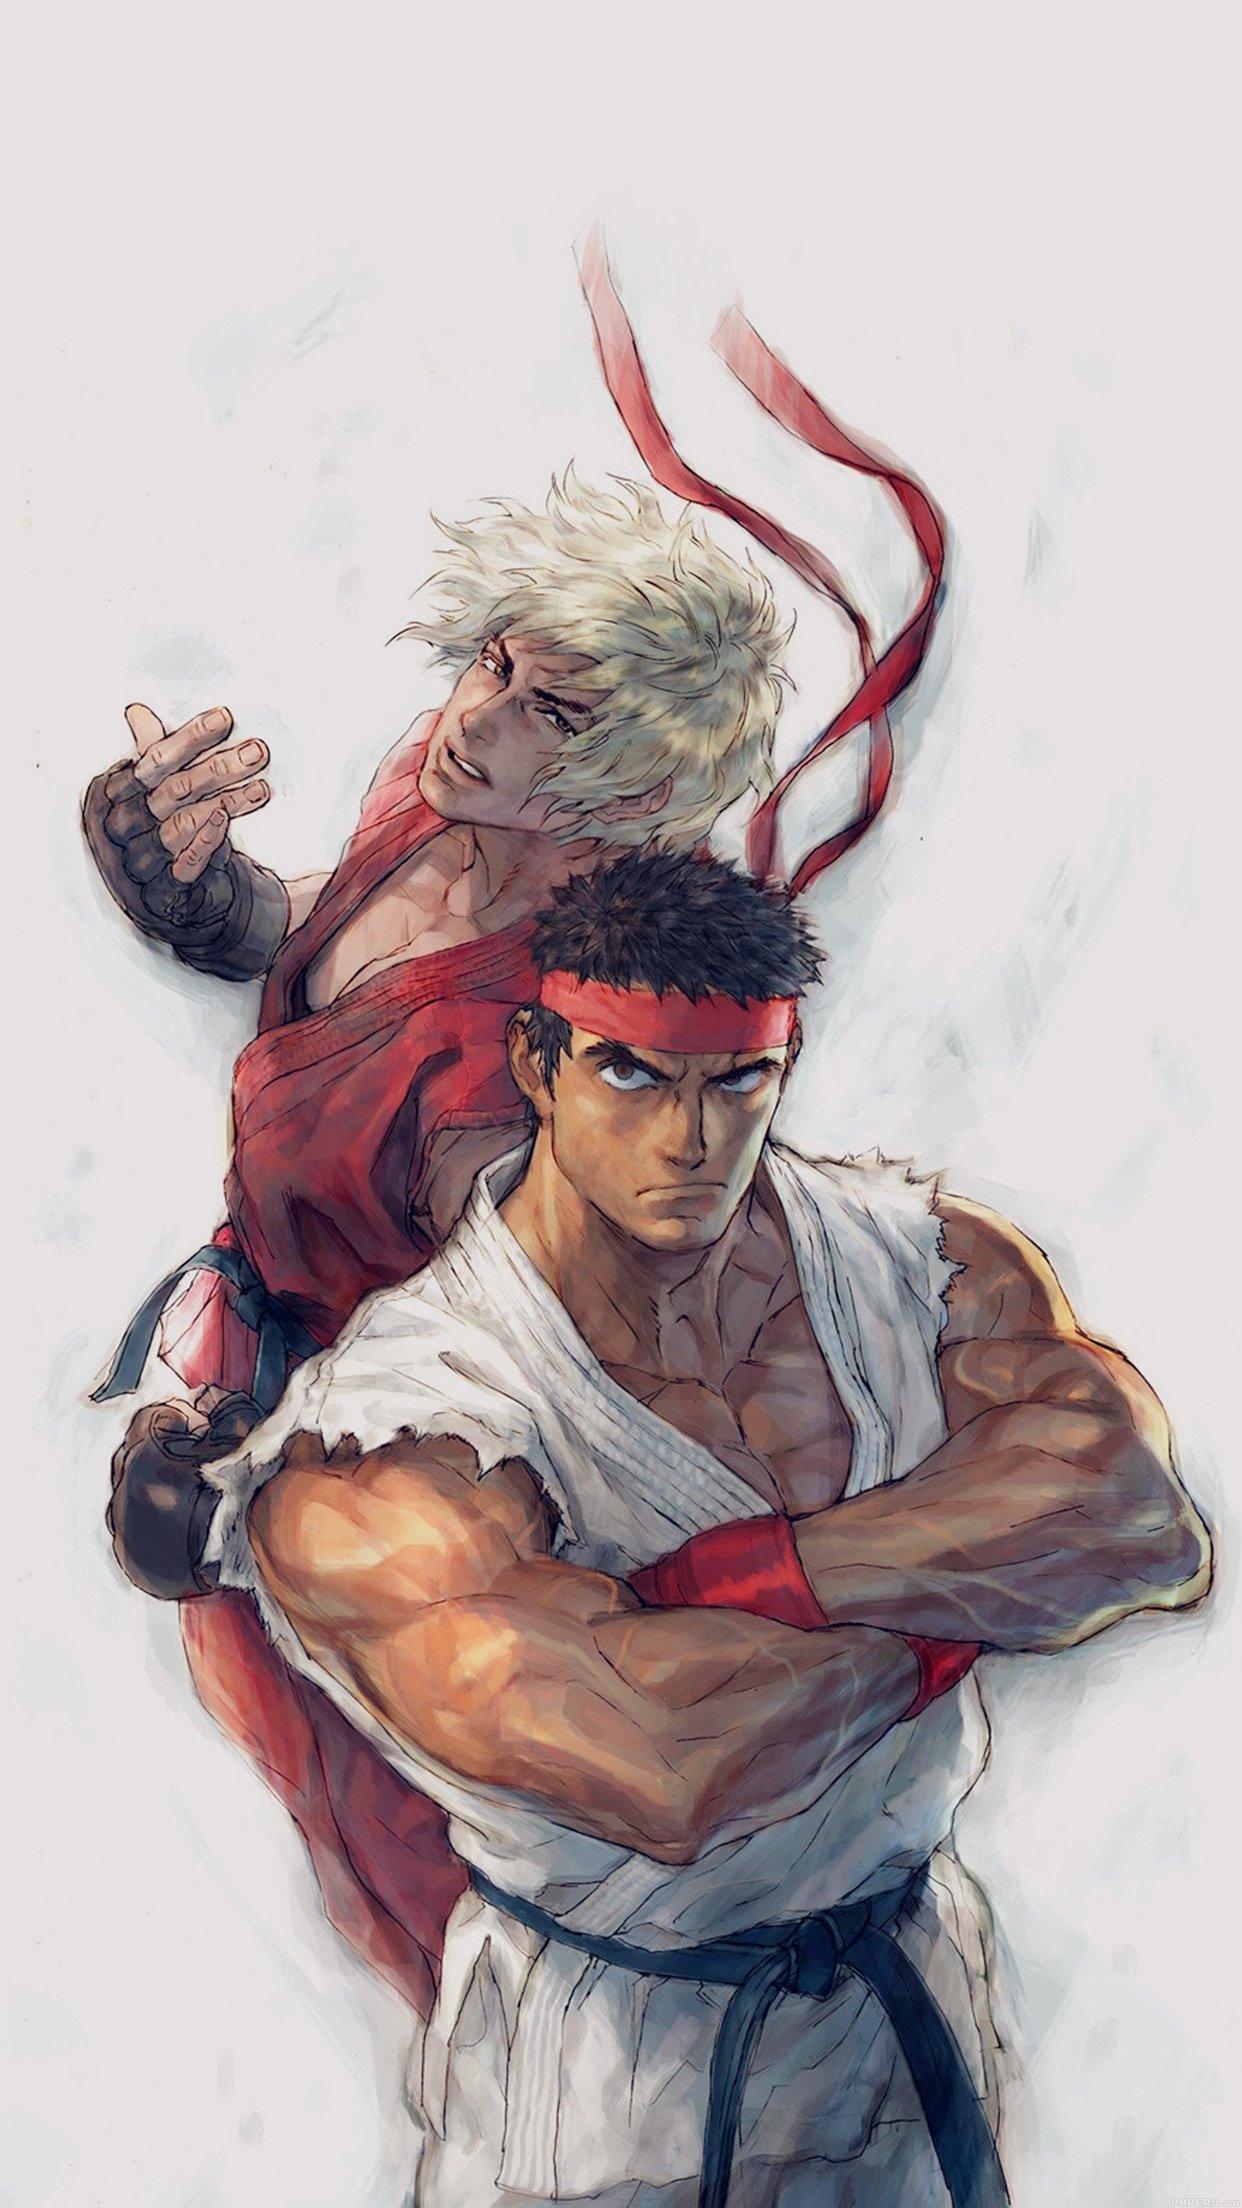 Anime Street Fighters Ryu Ken Art Illust Android Wallpaper